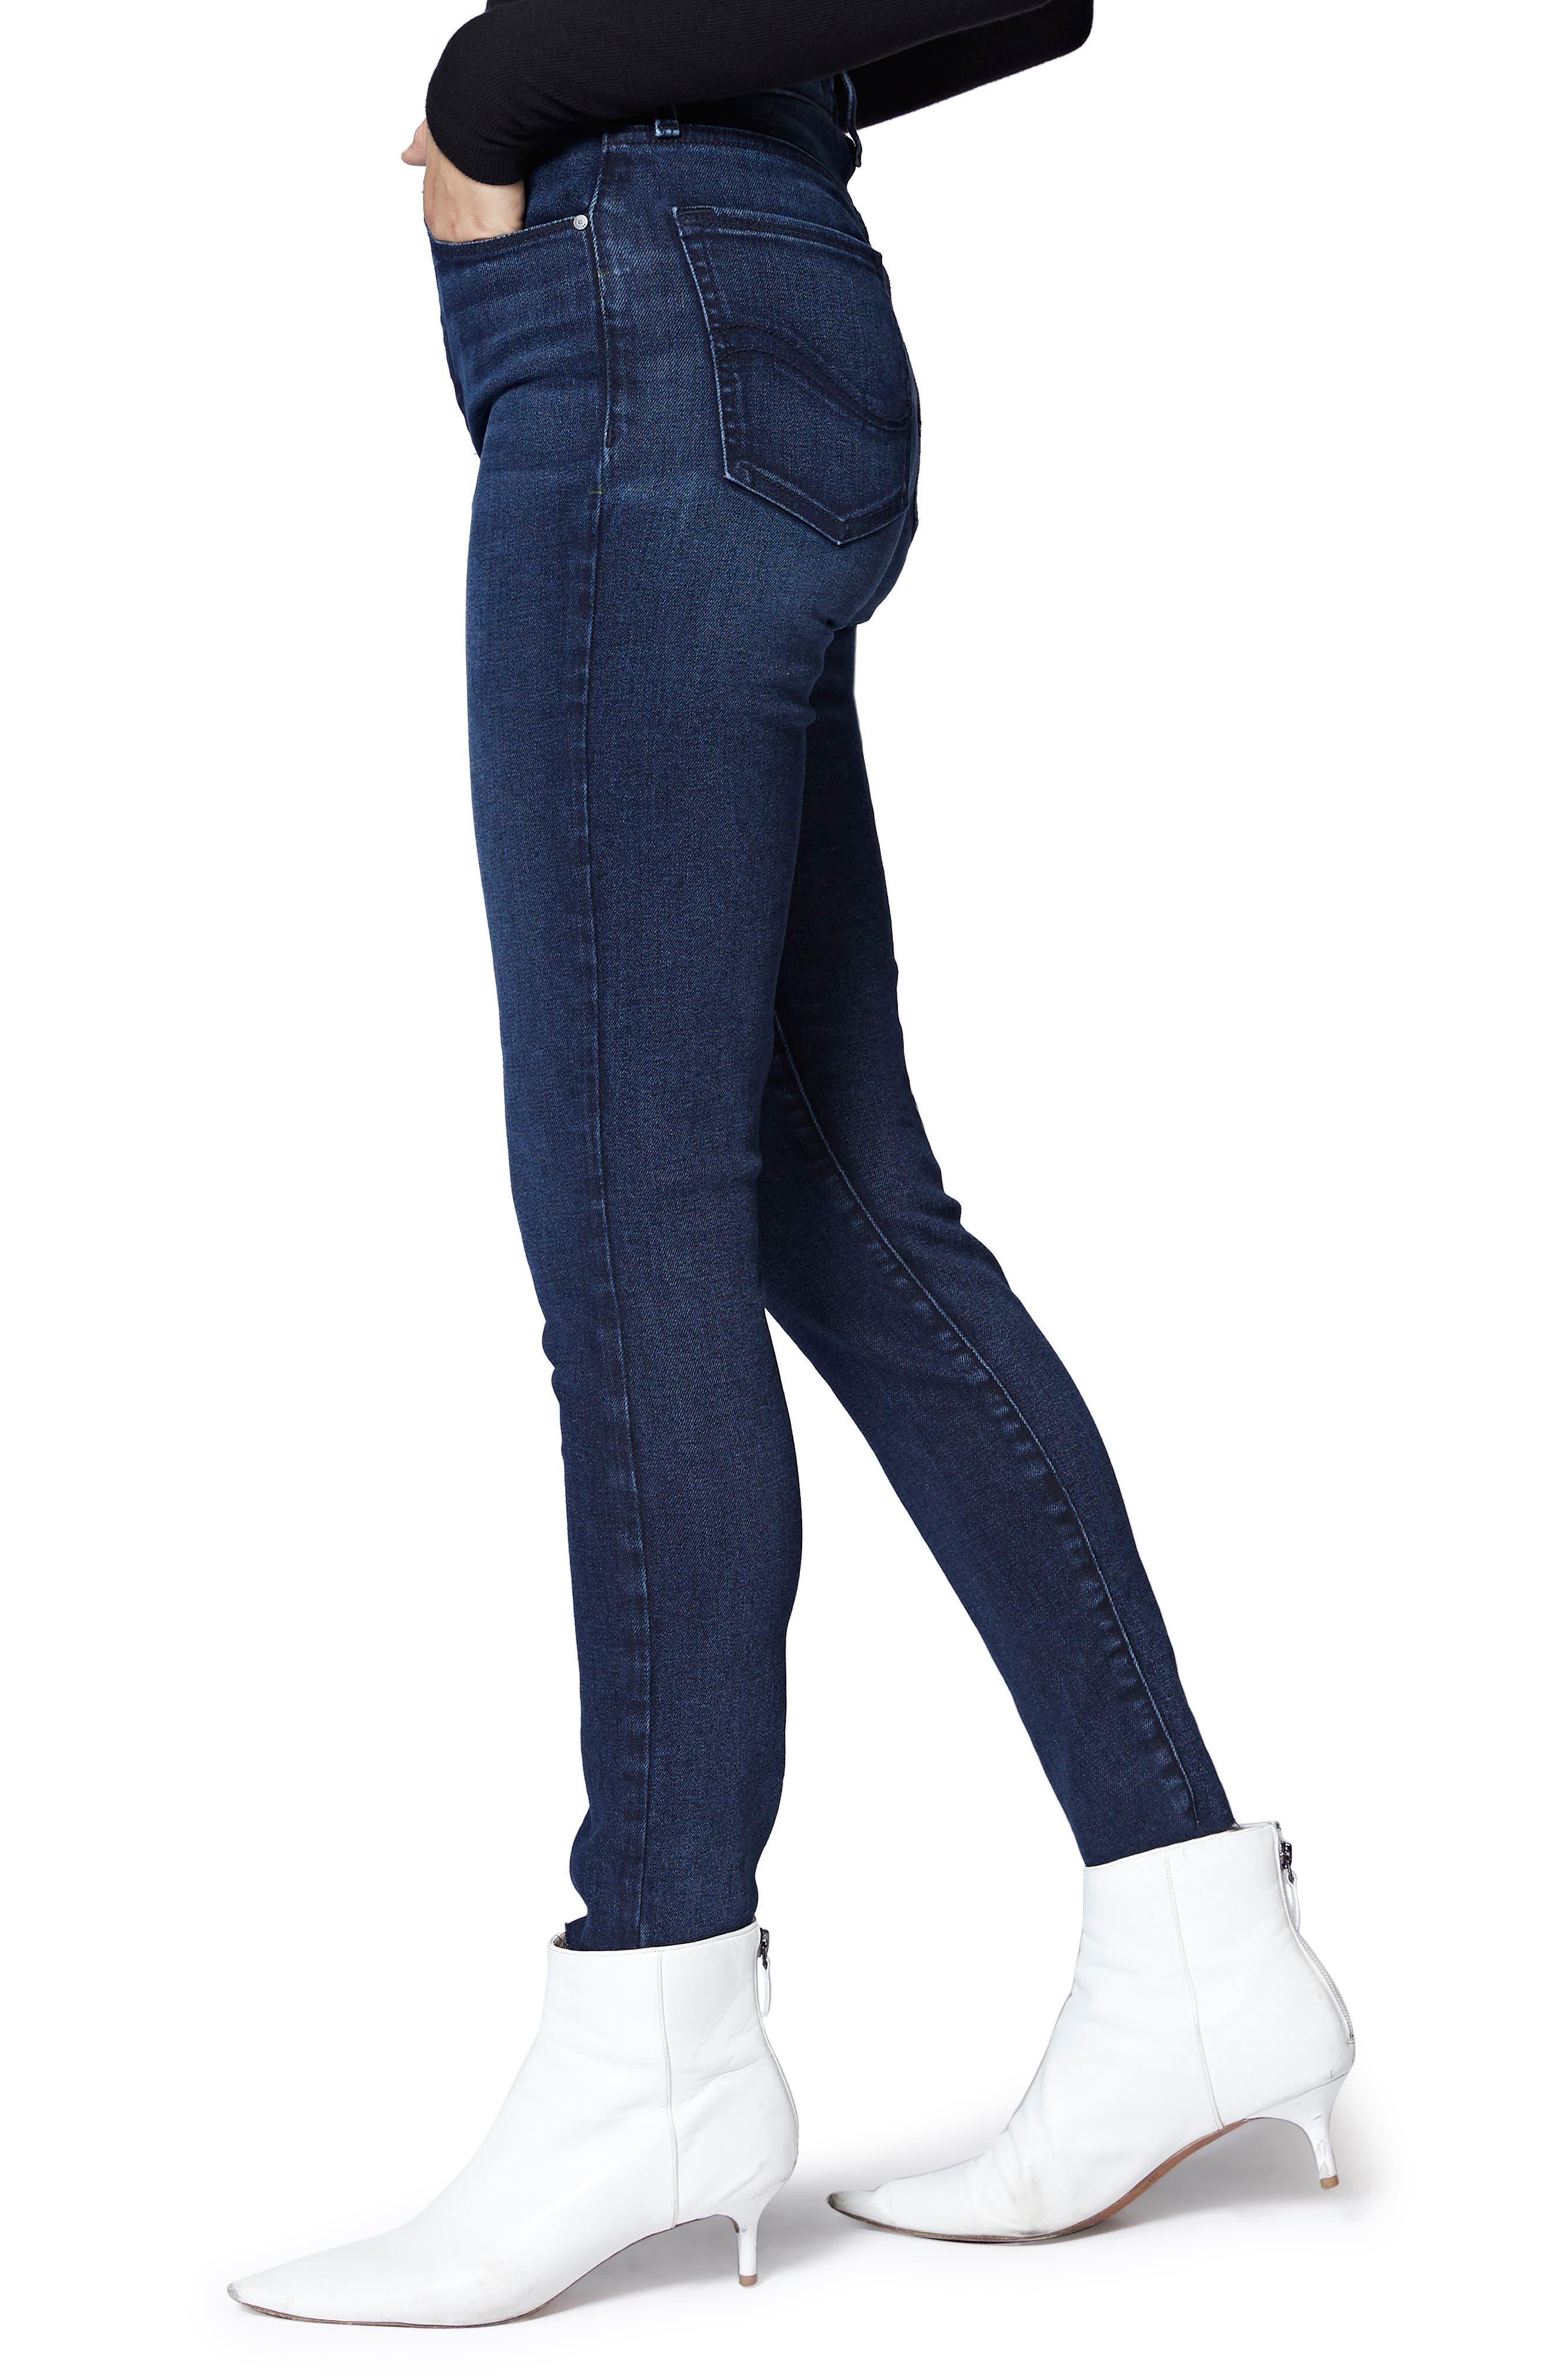 SANCTUARY,                             Social High Rise Raw Hem Skinny Ankle Jeans,                             Alternate thumbnail 3, color,                             401